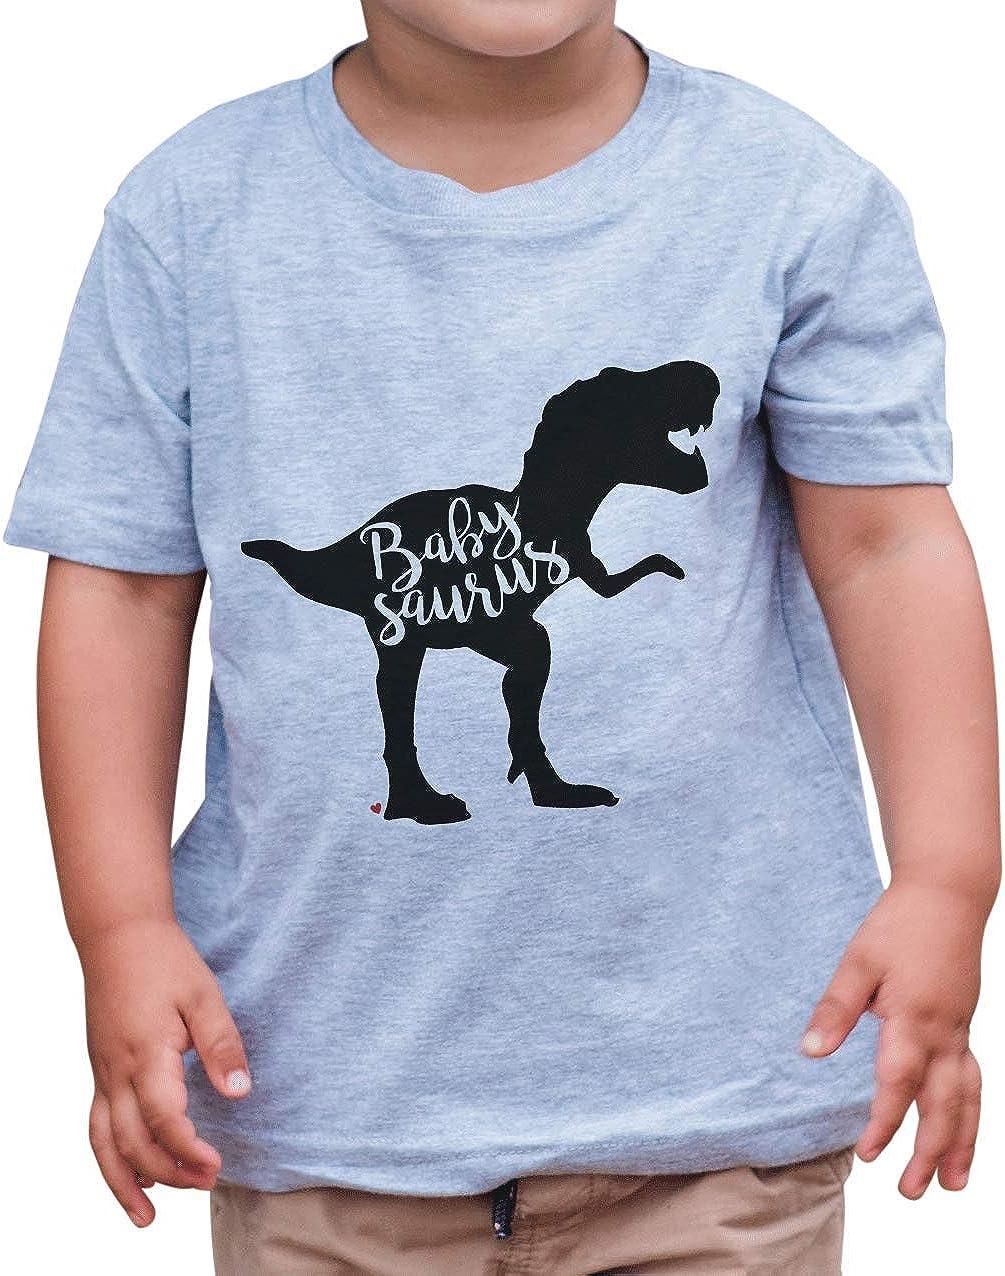 7 ate 9 Apparel Kid's Babysaurus Dinosaur Grey T-Shirt